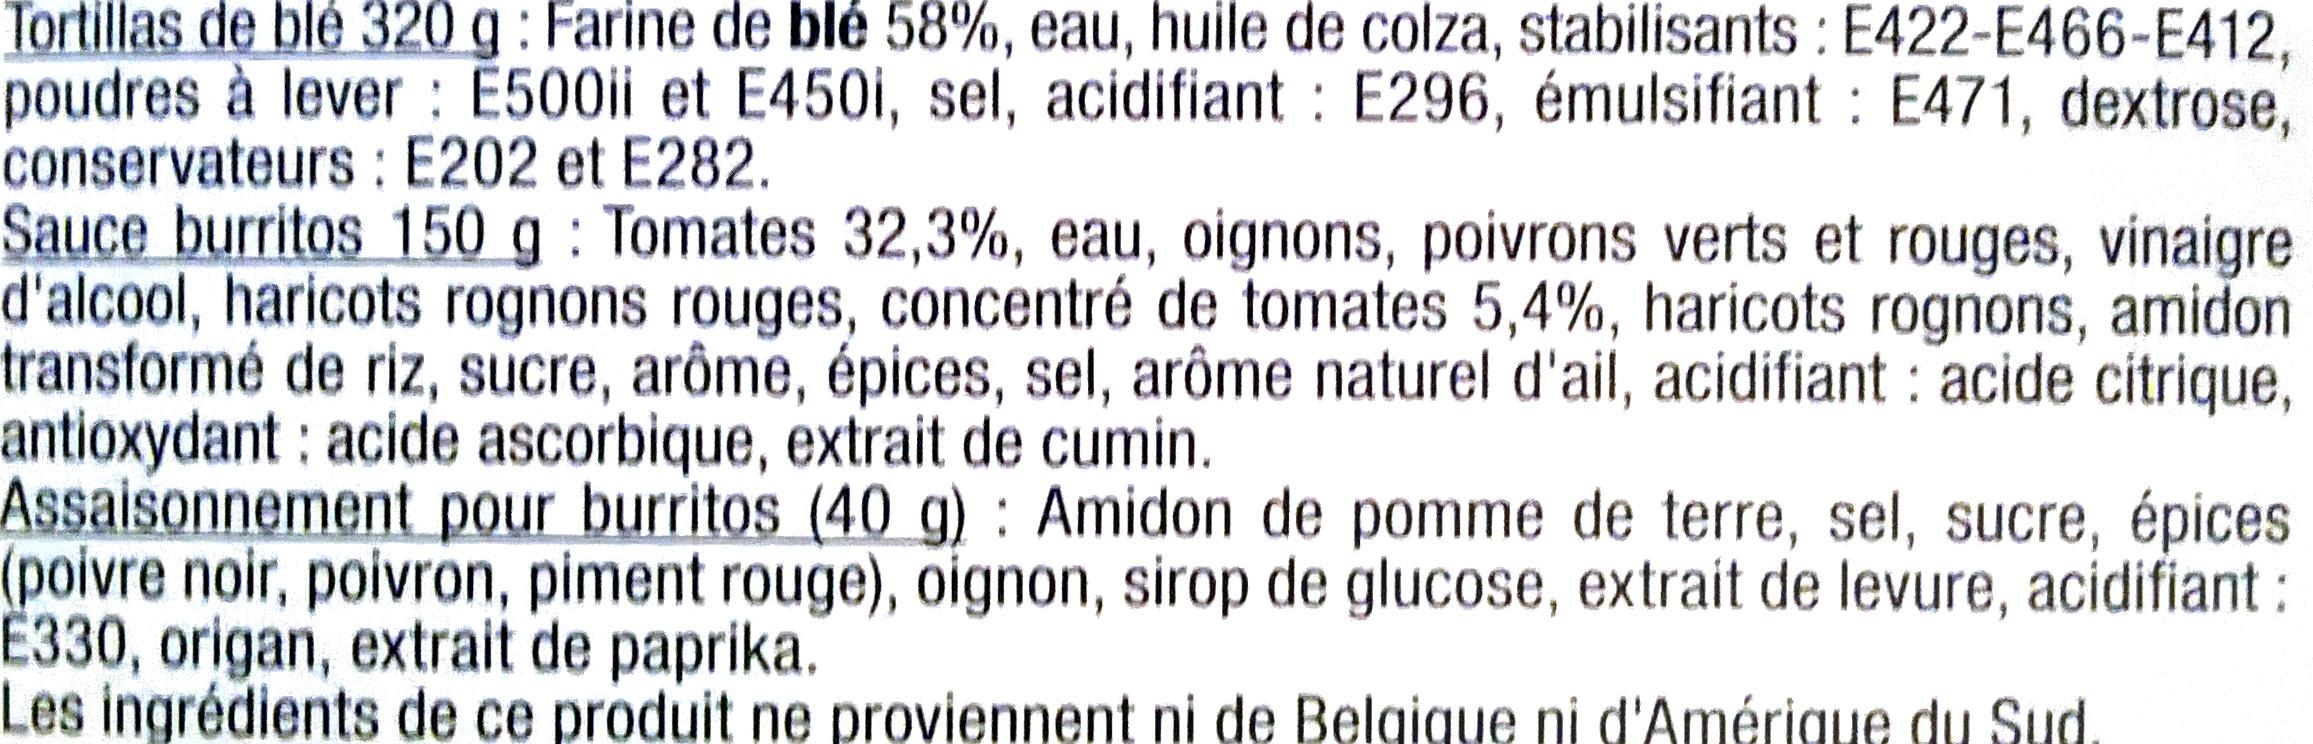 Kit pour burritos - Ingrediënten